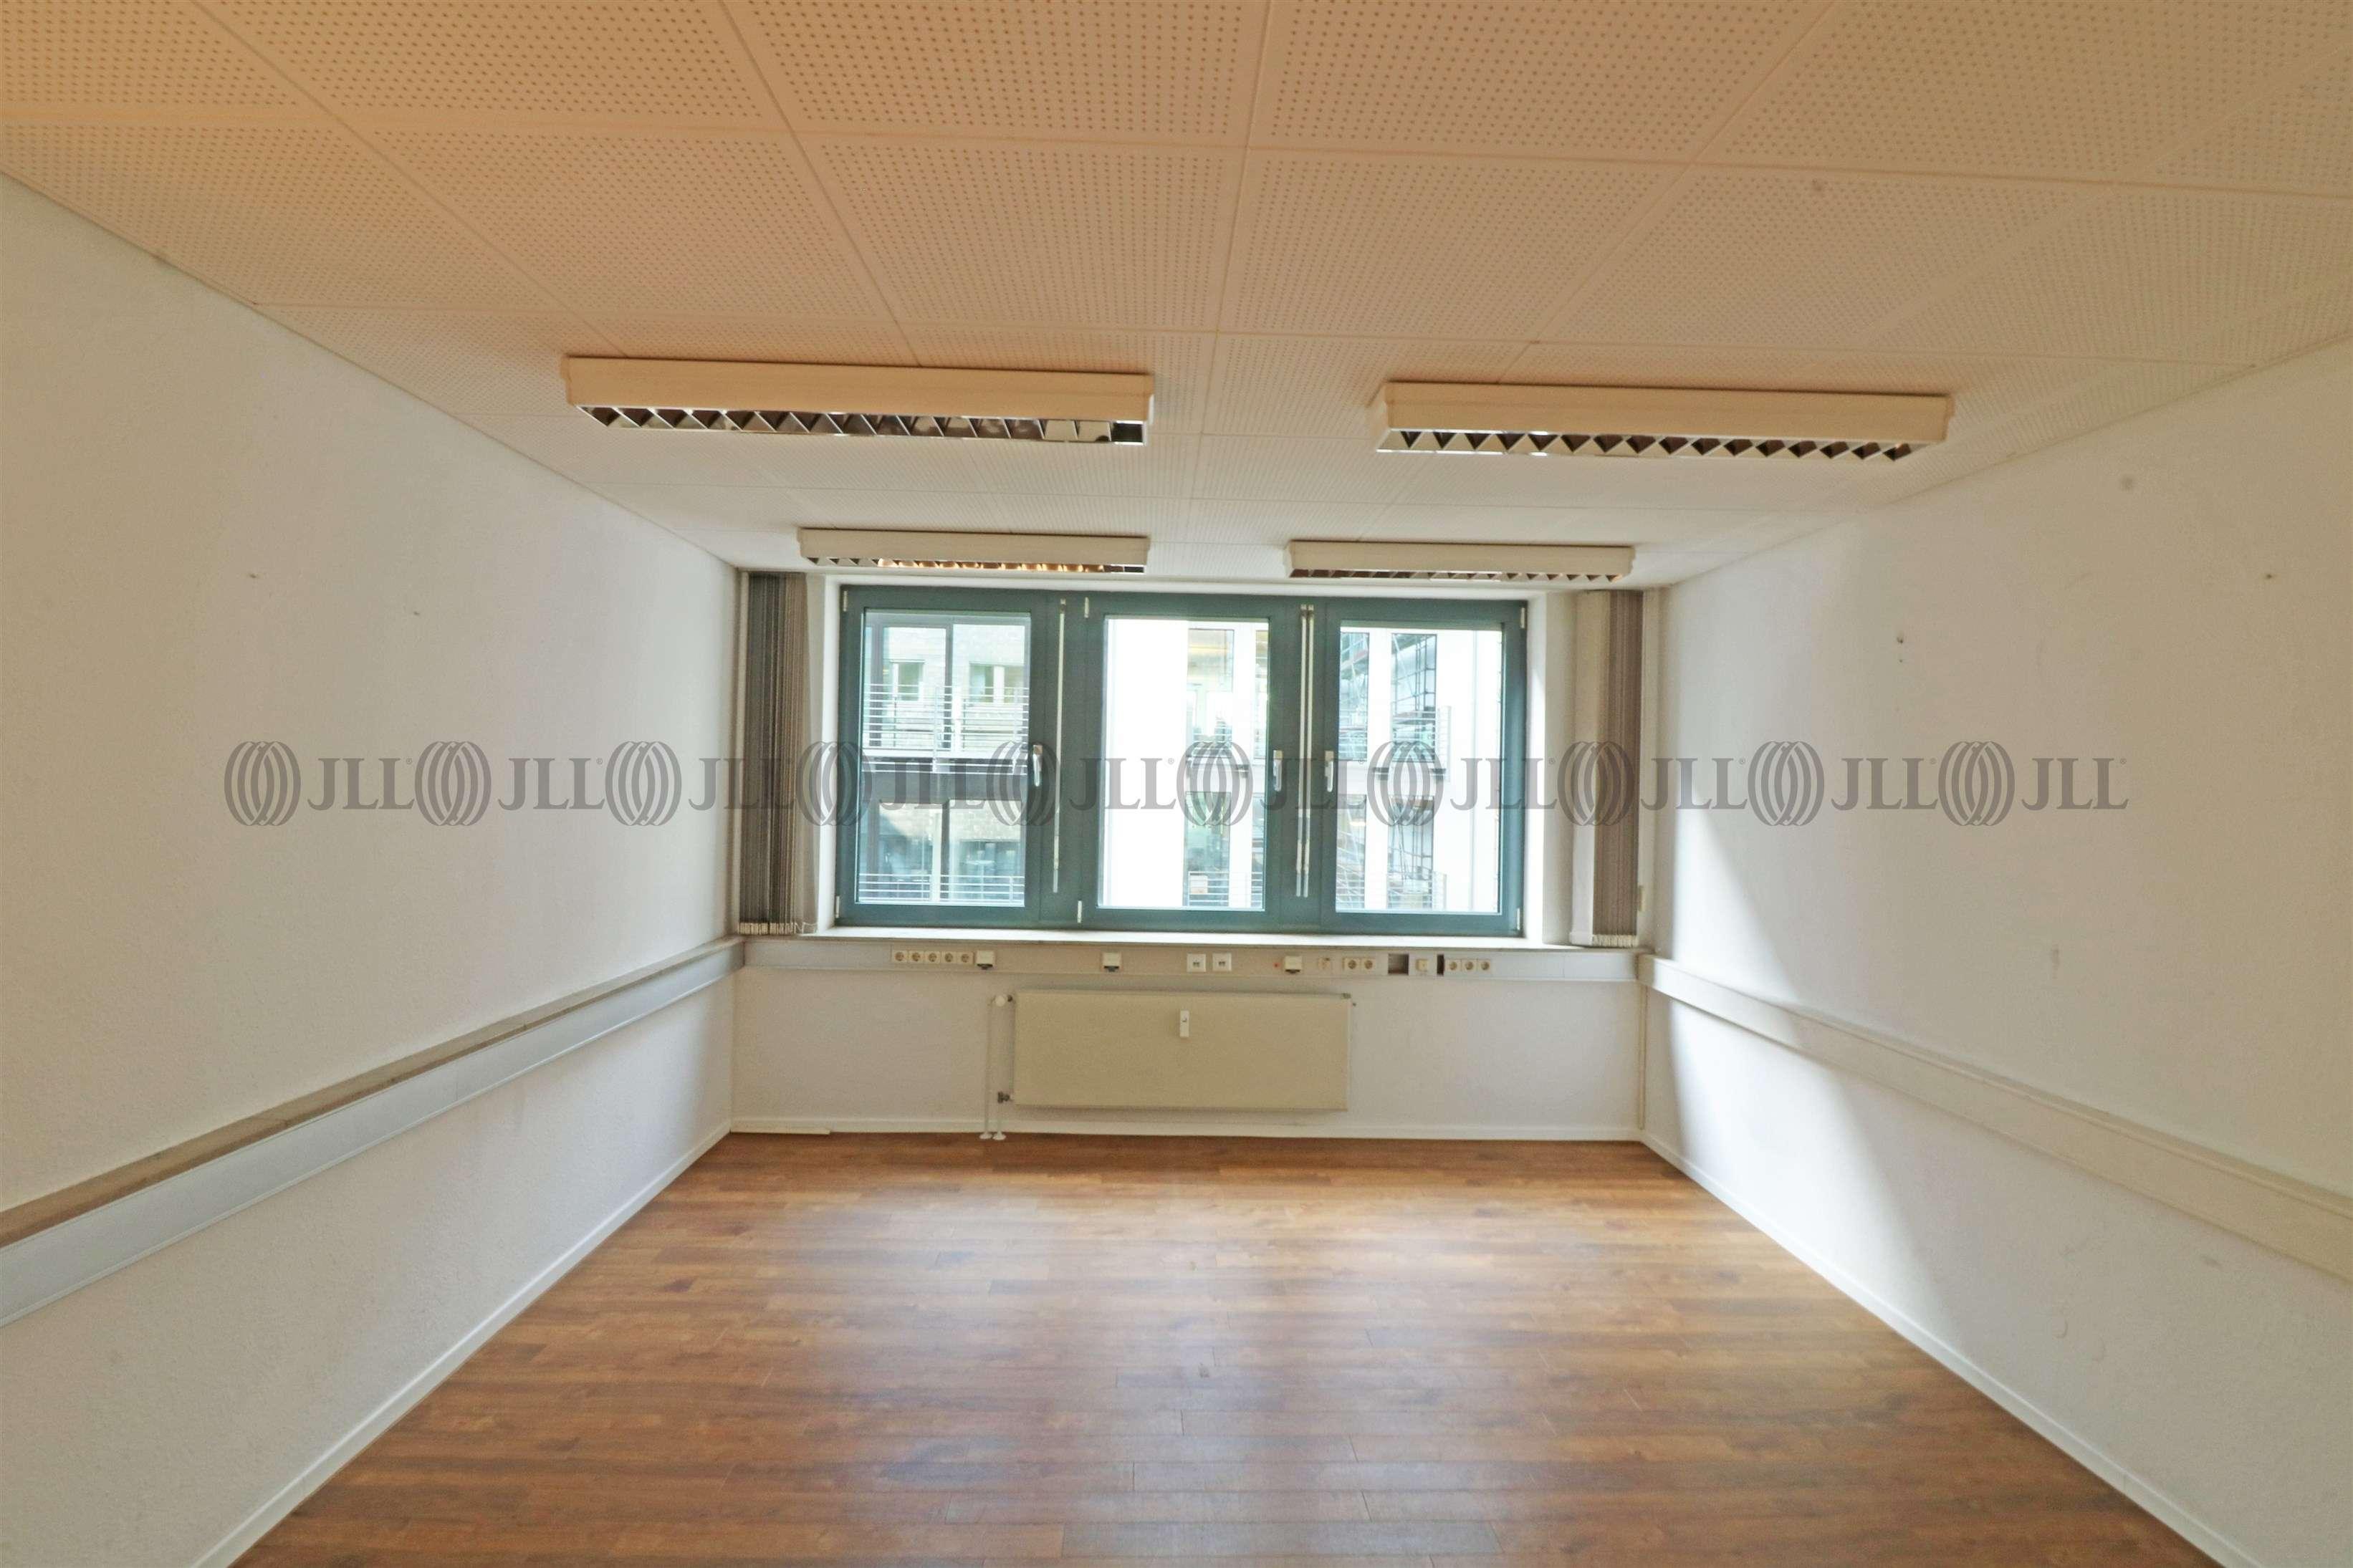 Büros Hamburg, 20457 - Büro - Hamburg, Altstadt - H0137 - 10043883